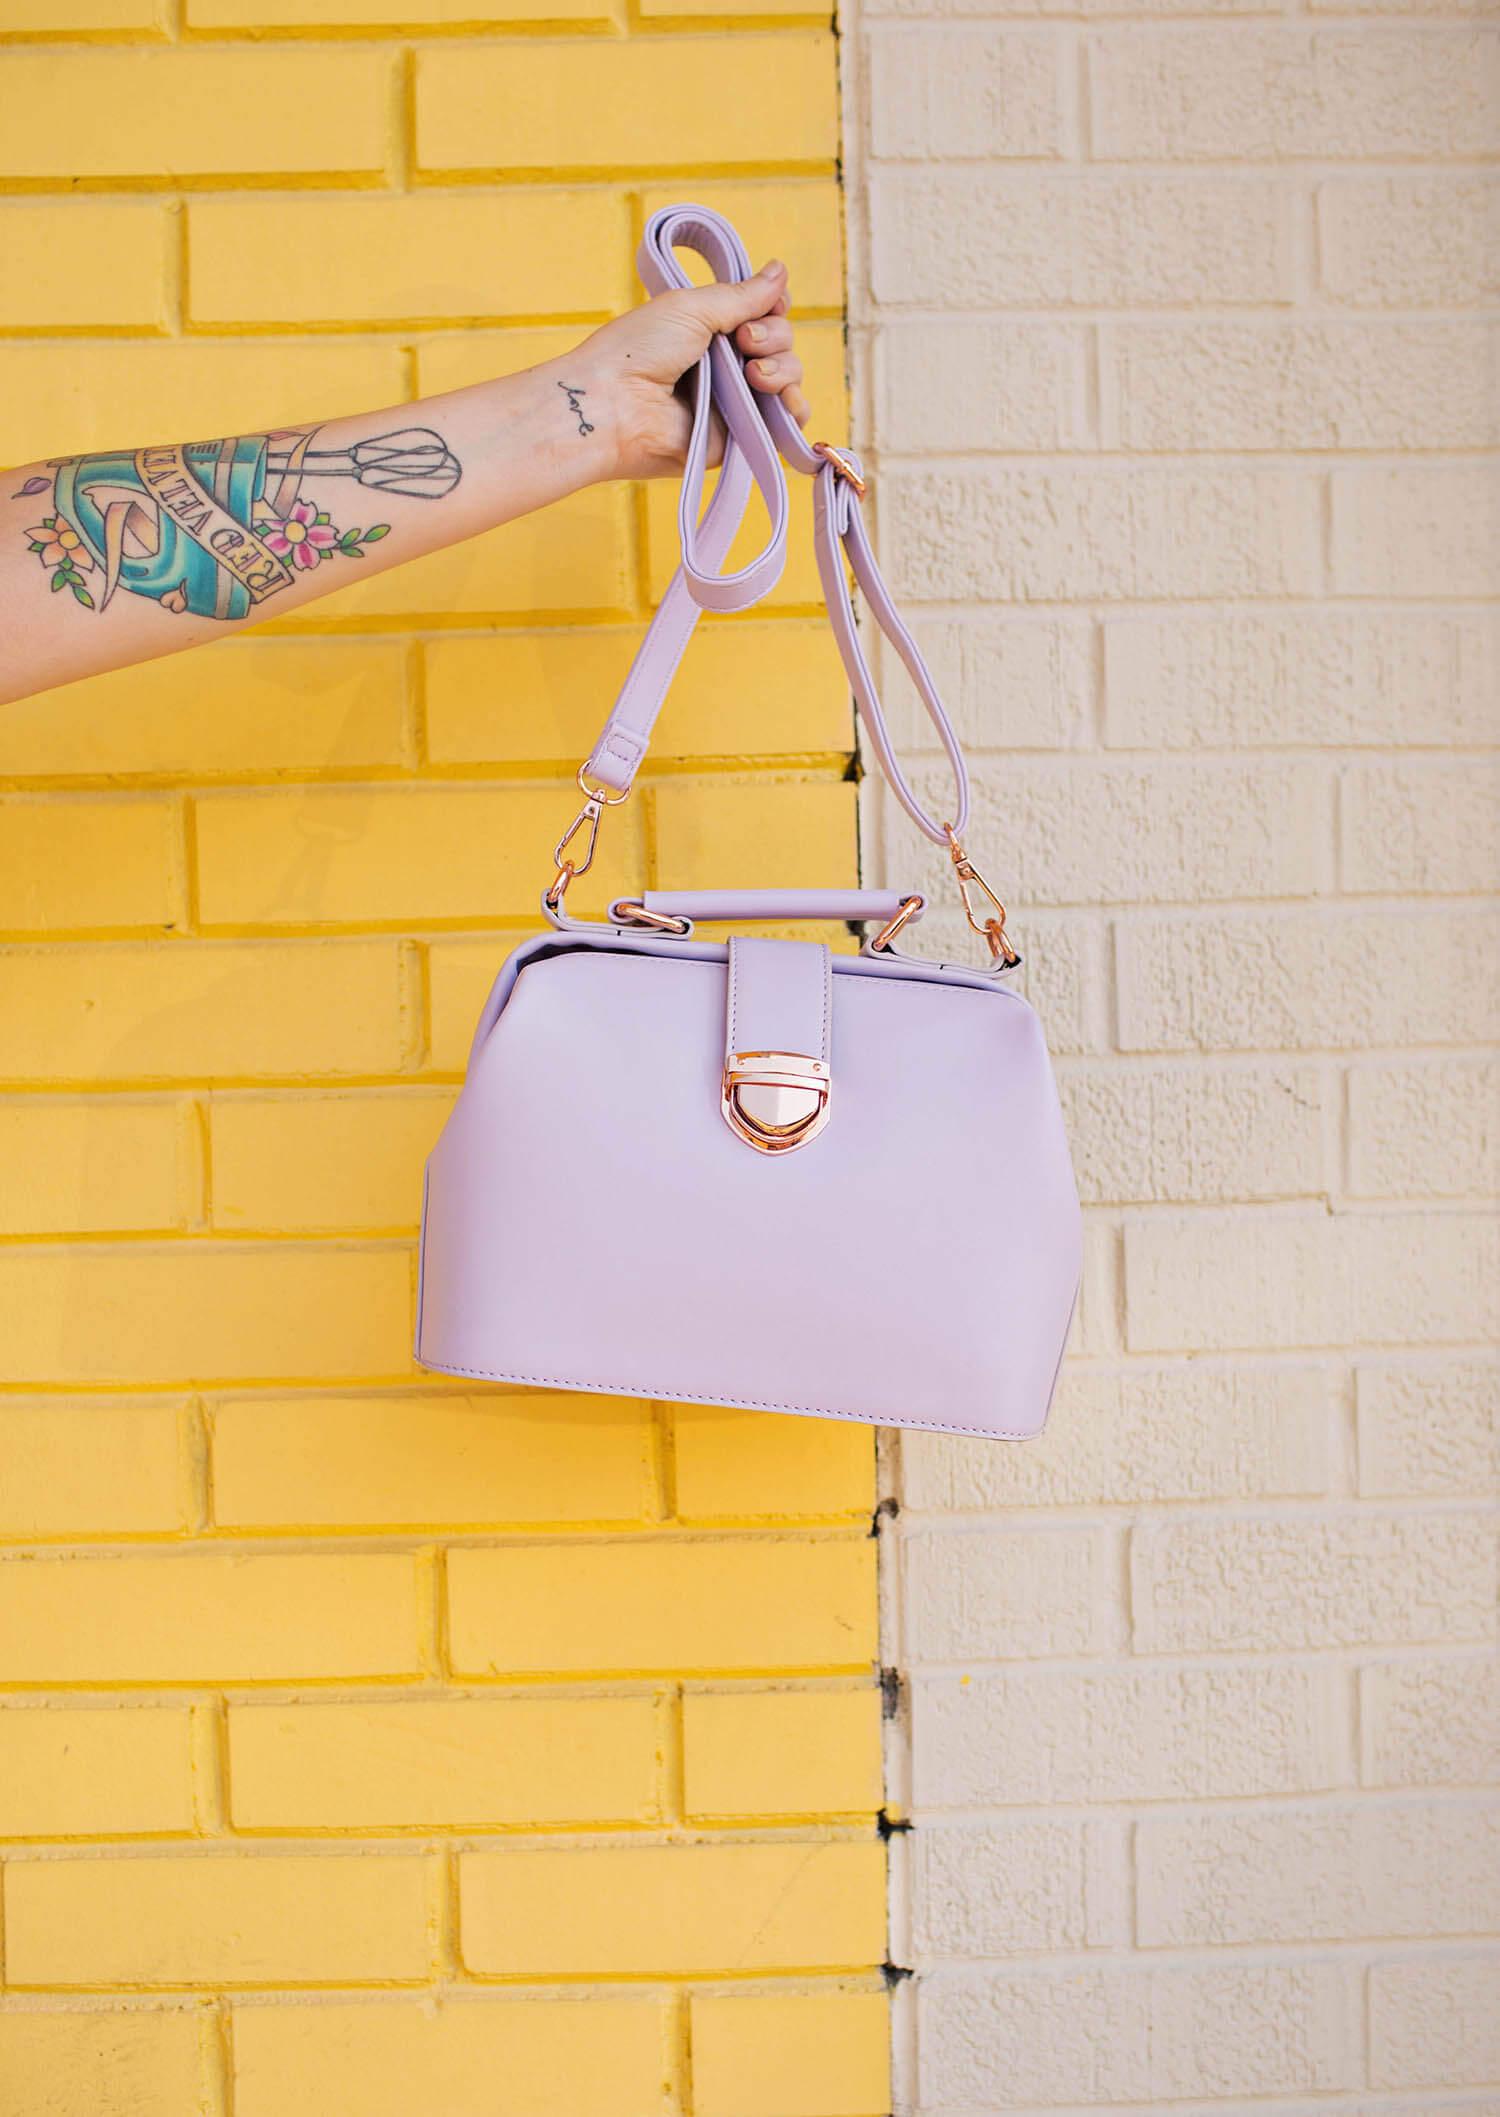 Lavender purse